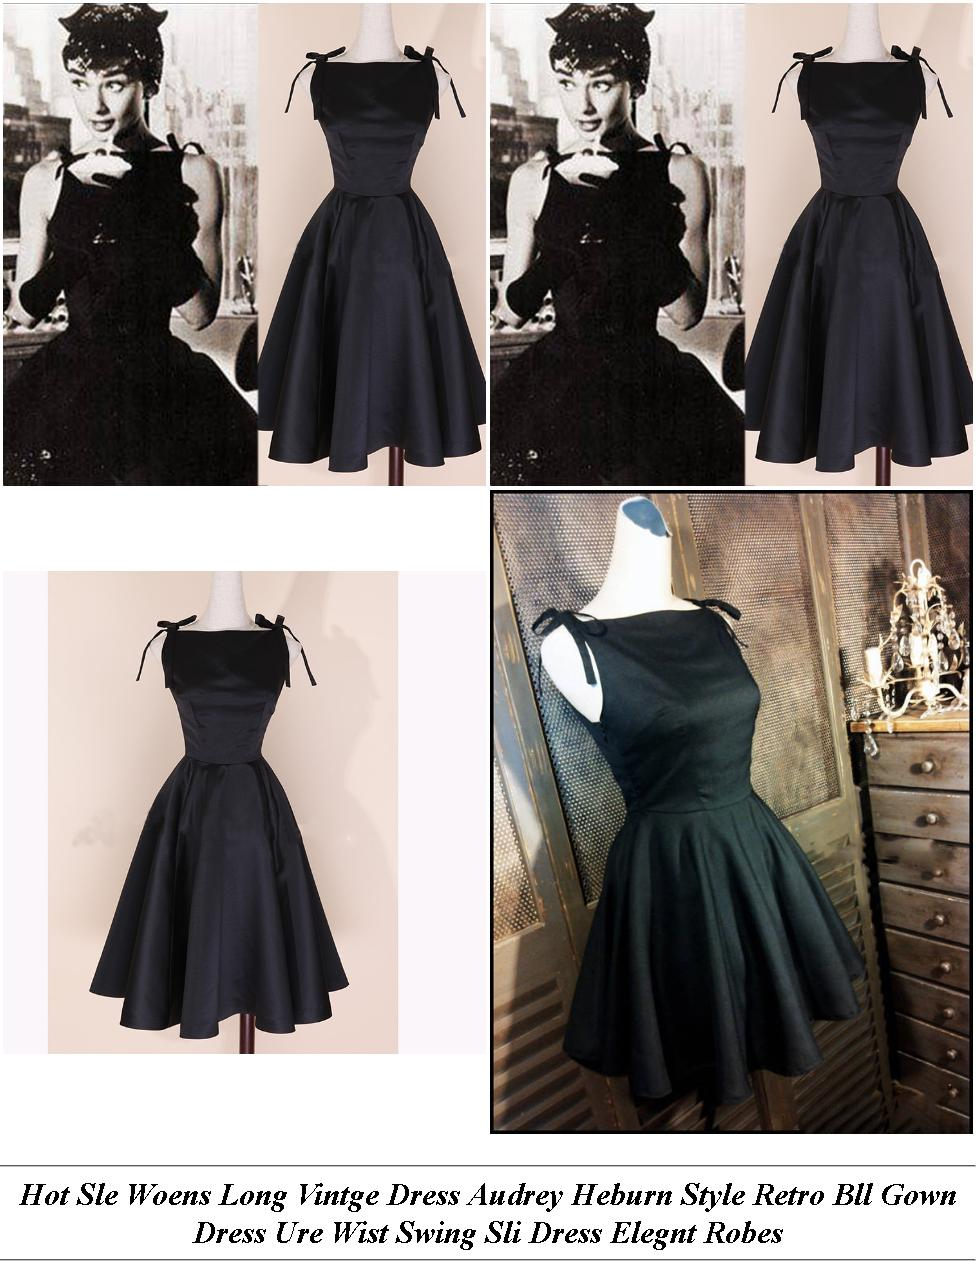 Beach Wedding Dresses - Online Sale India - Little Black Dress - Cheap Branded Clothes